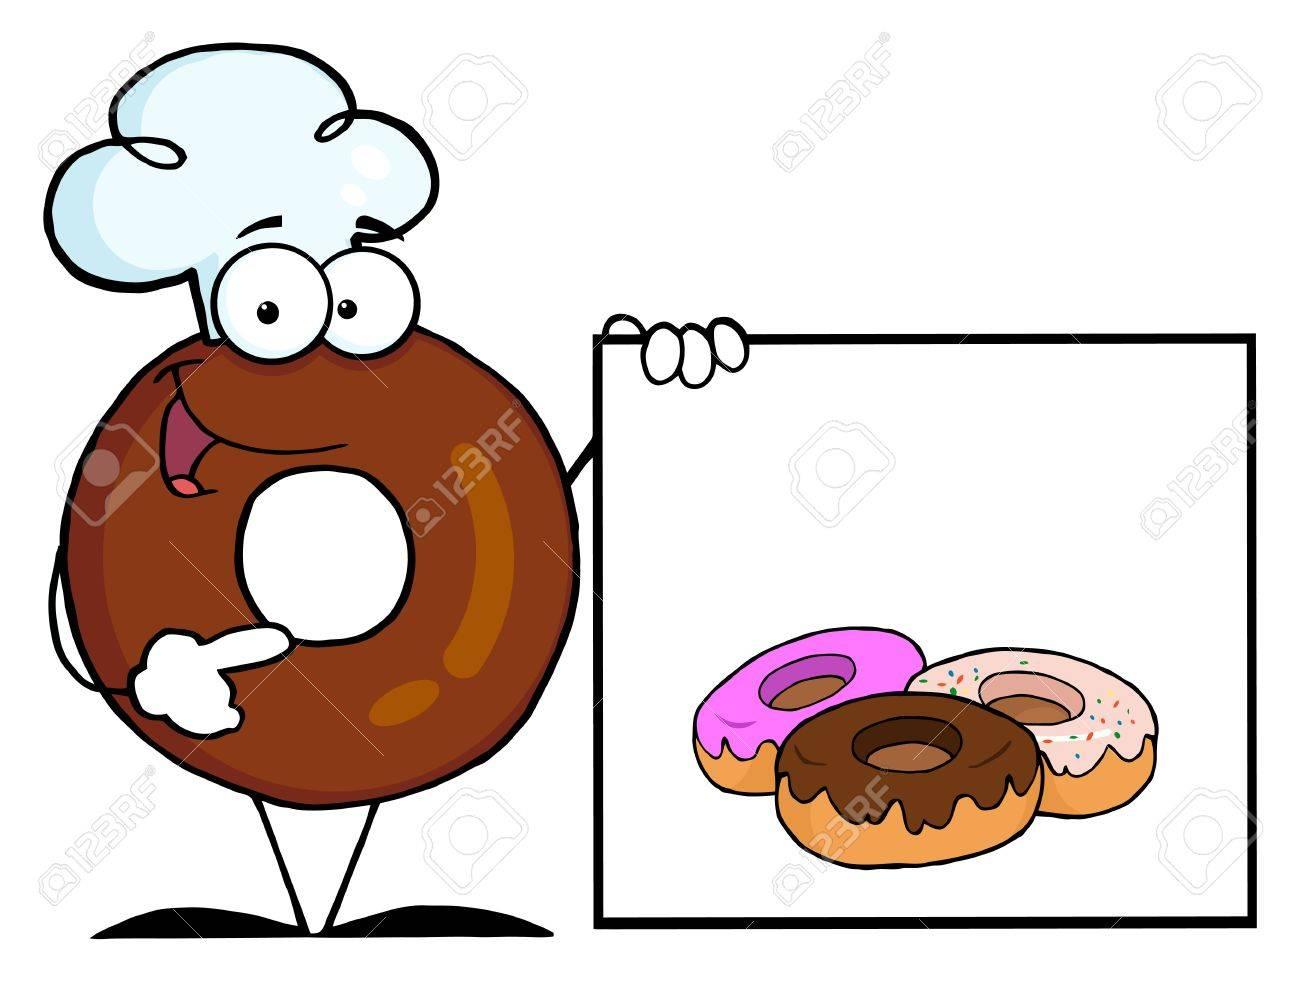 Personnage De Dessin Anime Donut Chef Presentant Un Signe Blanc